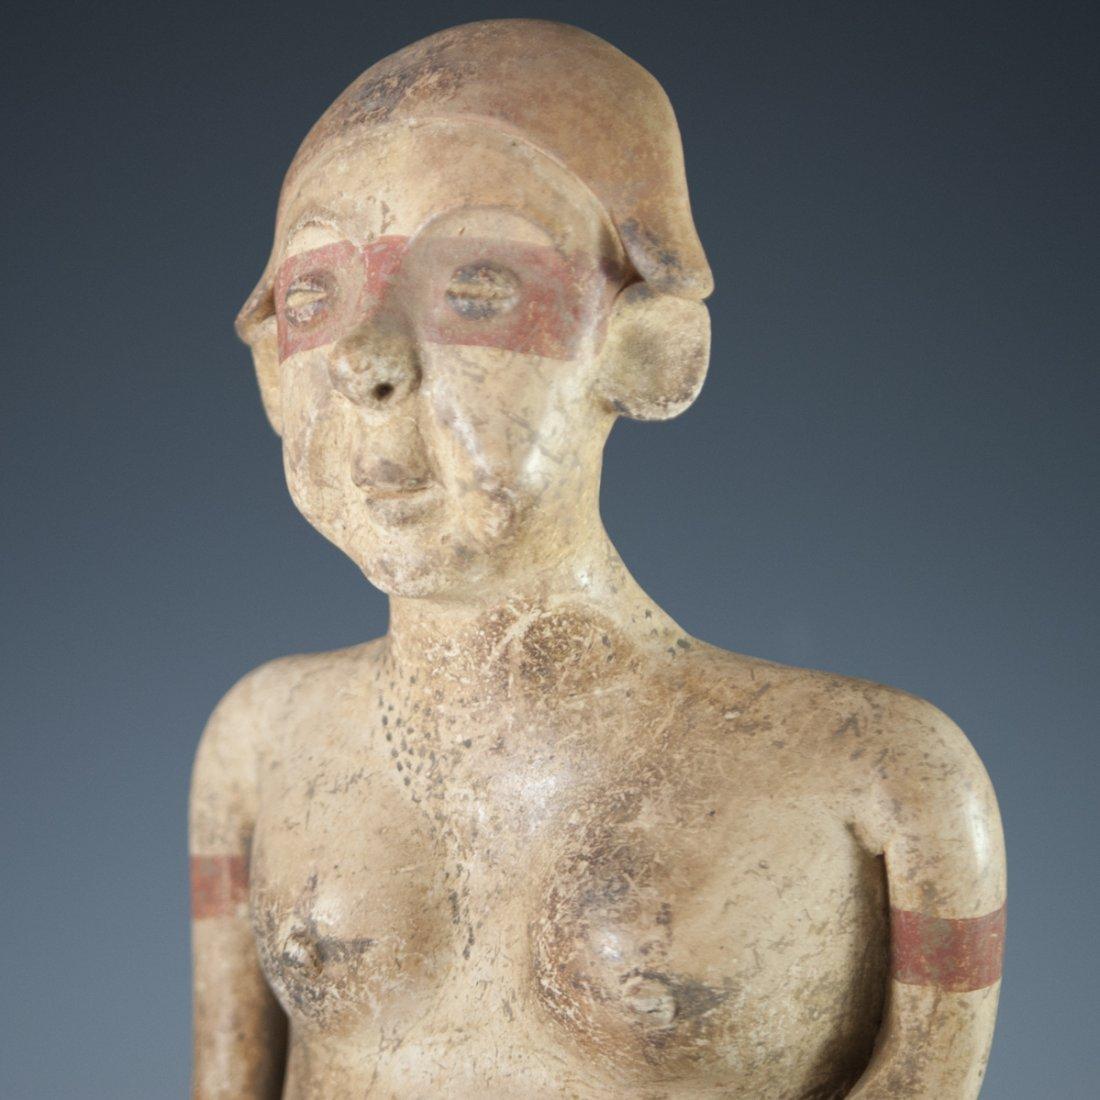 Probably Pre-Columbian Mayan Figurine - 2